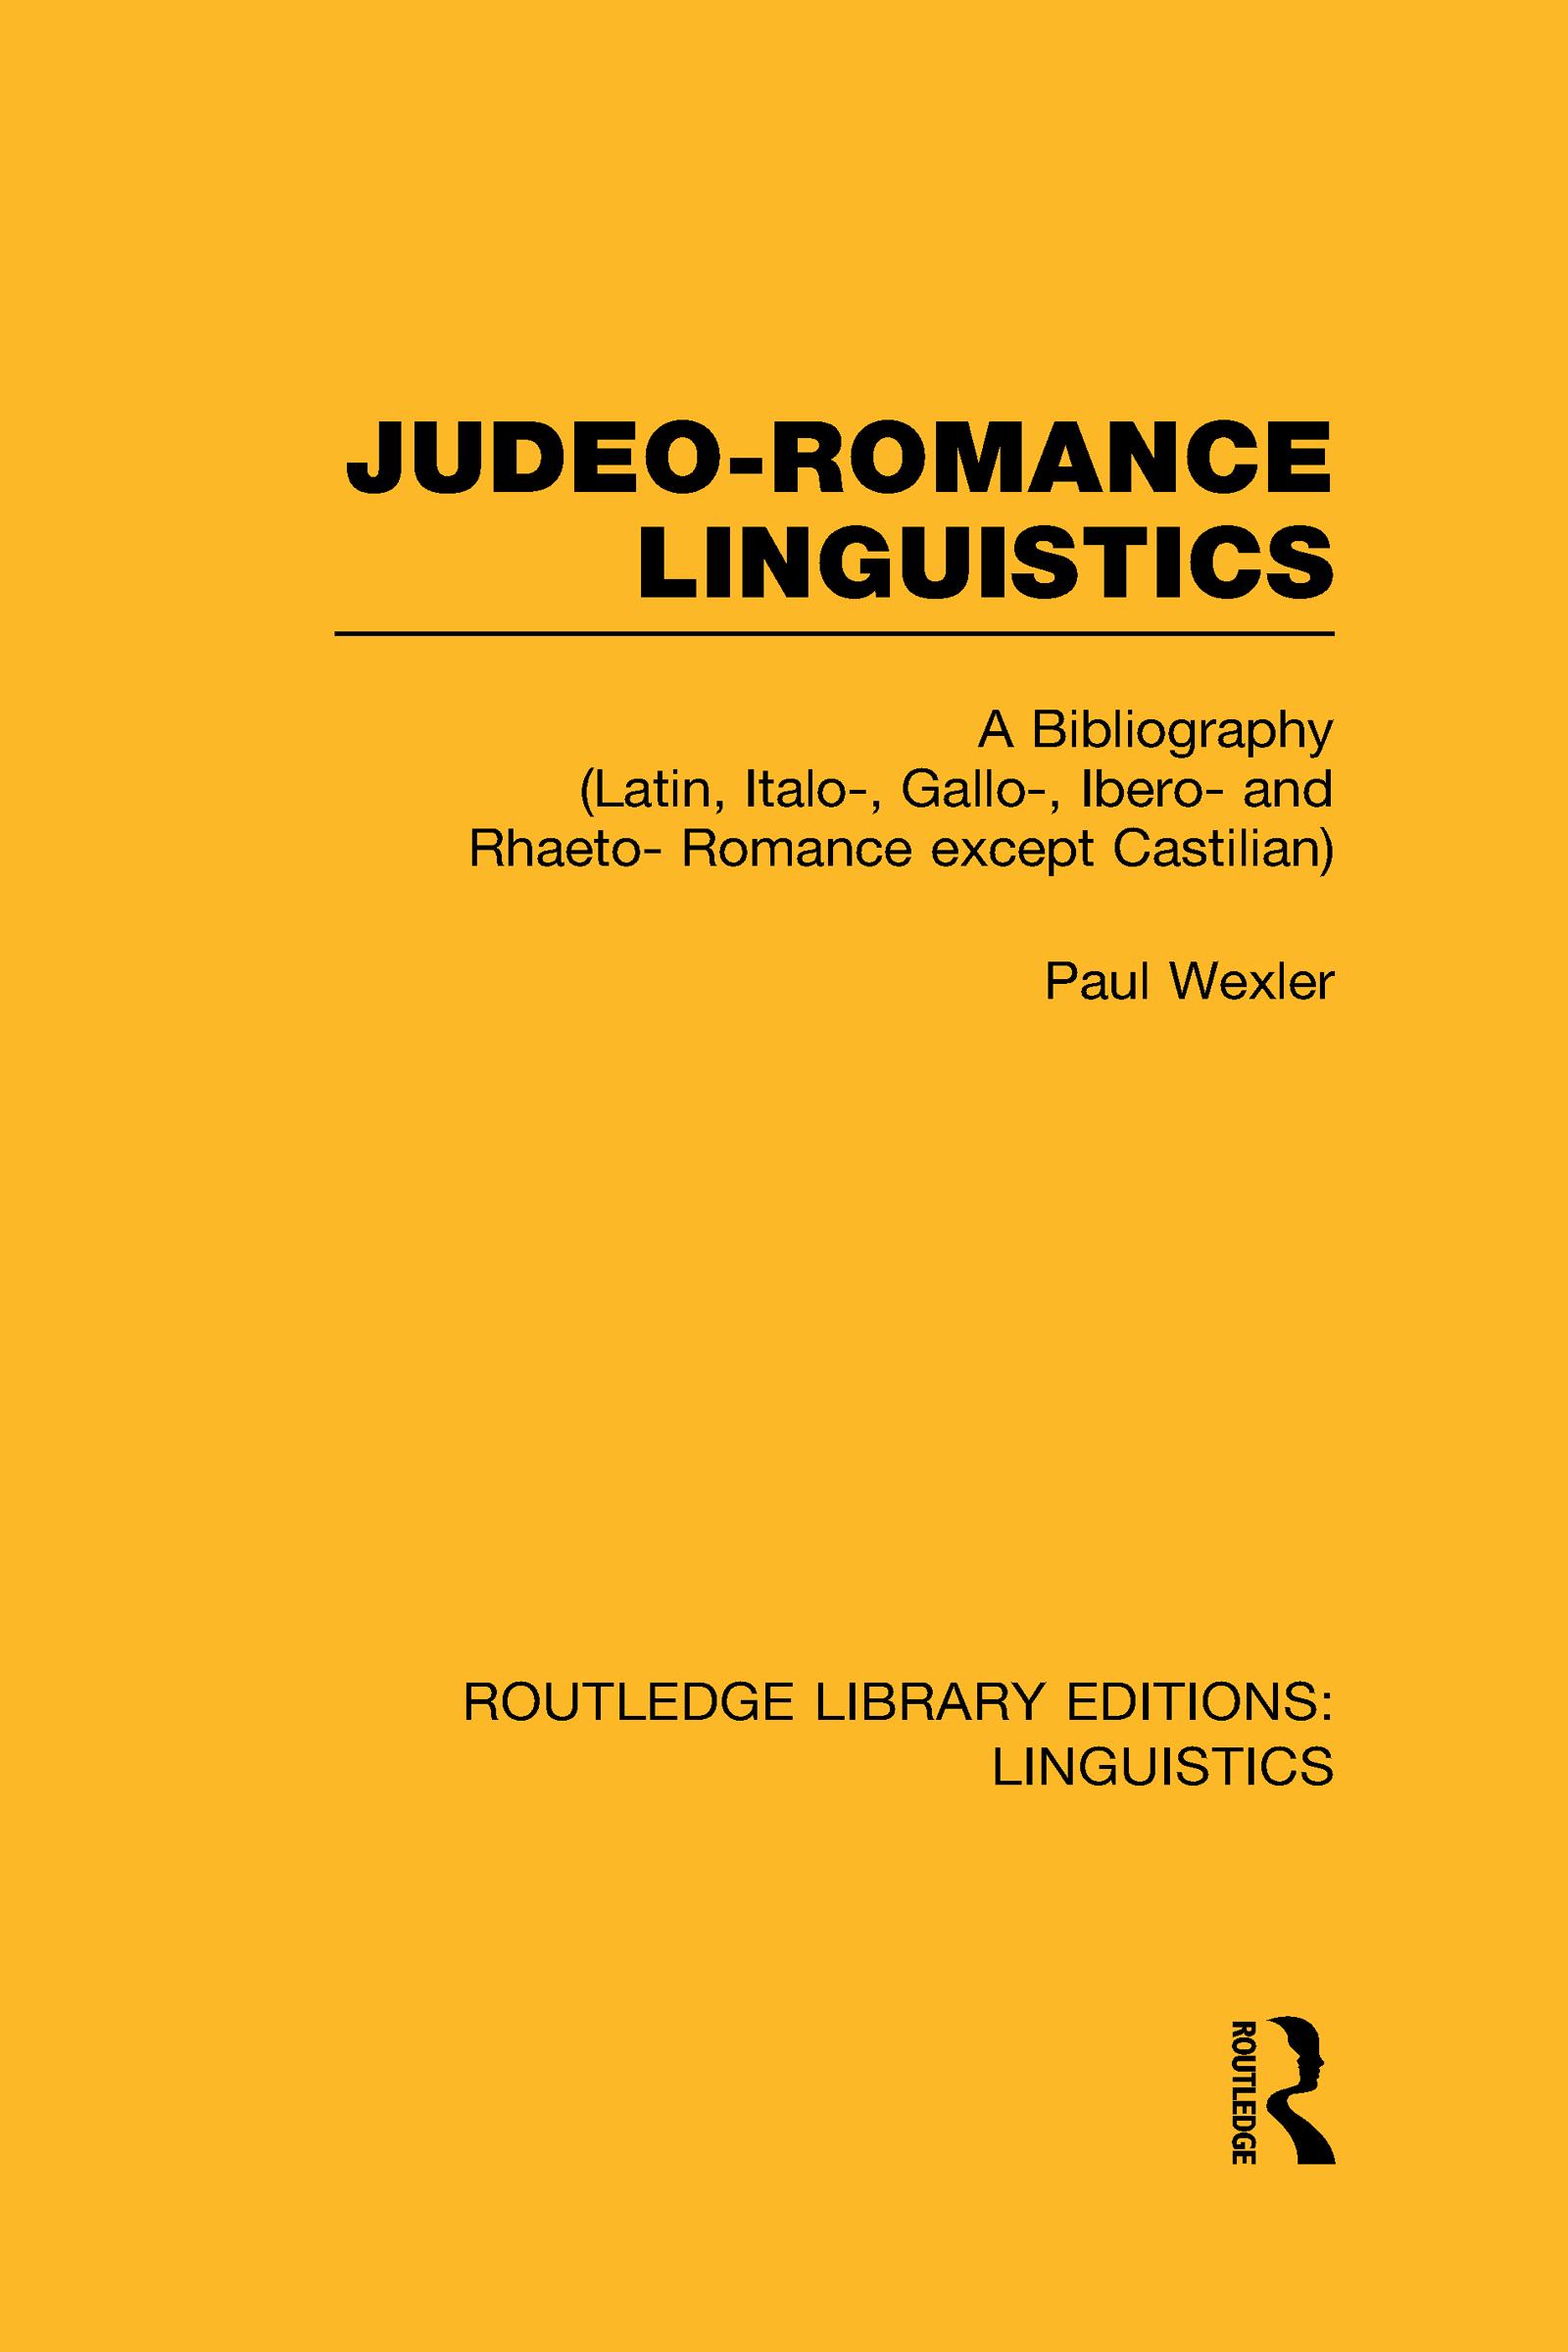 Judeo-Romance Linguistics (RLE Linguistics E: Indo-European Linguistics): A Bibliography (Latin, Italo-, Gallo-, Ibero-, and Rhaeto-Romance except Castilian), 1st Edition (Hardback) book cover